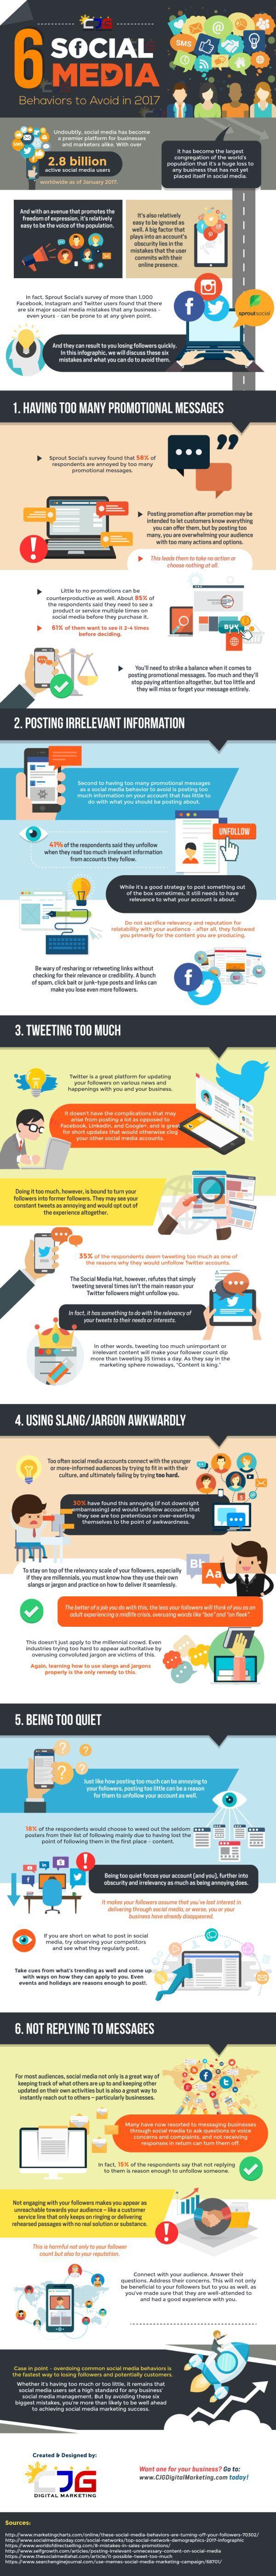 Brand managers: Avoid these 6 cringe-worthy social media behaviors - Infographic